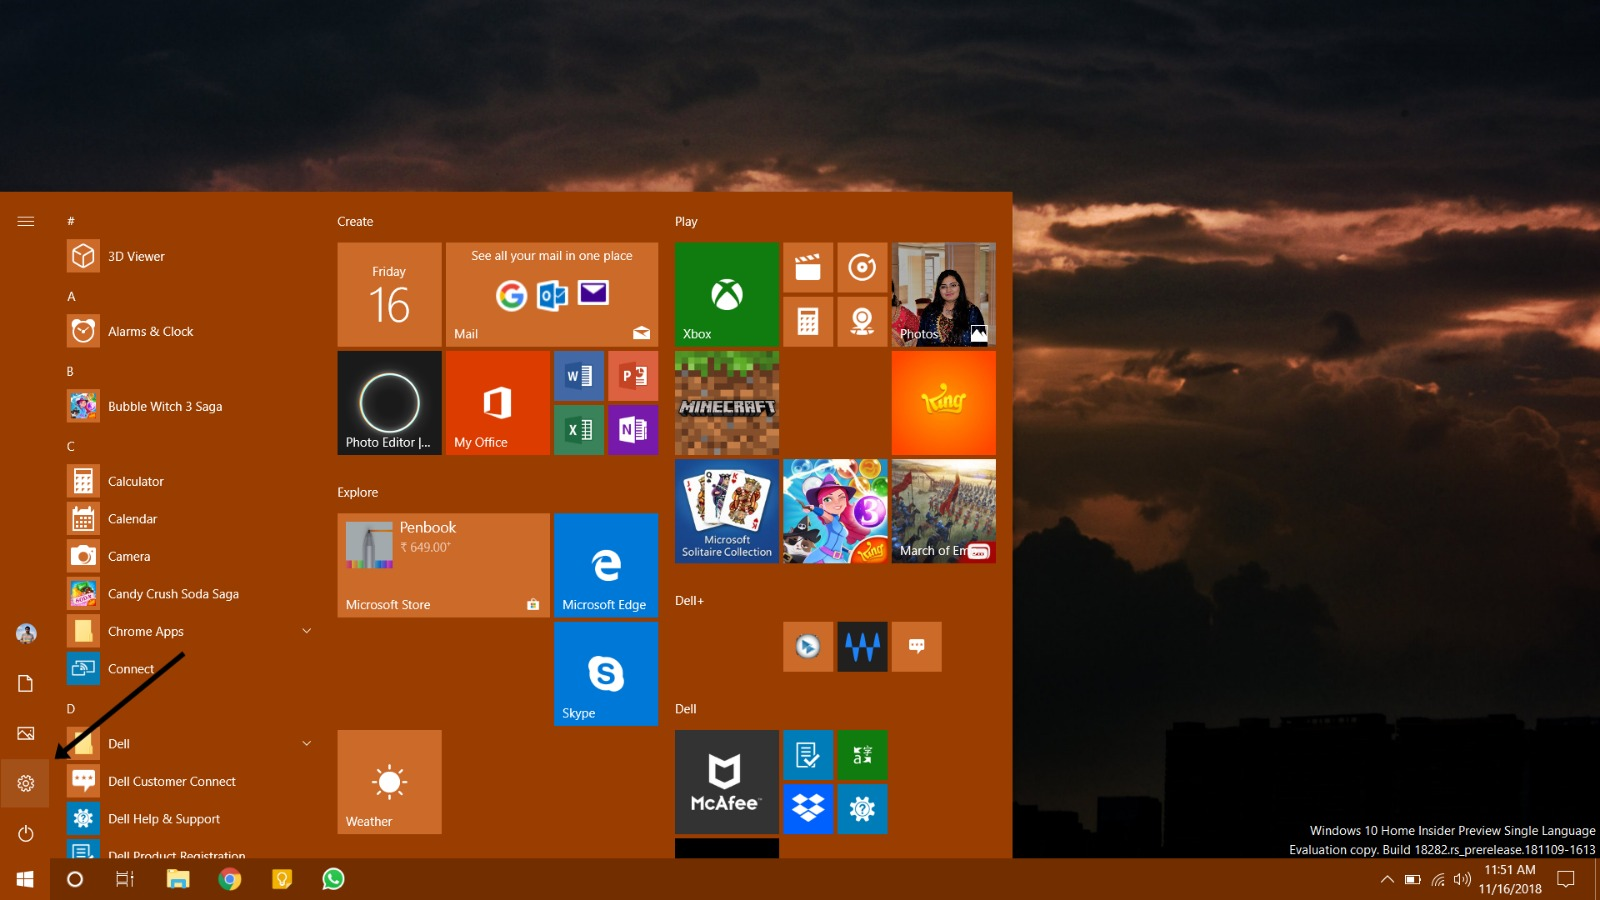 Click on the Settings icon inside Windows 10 Start Menu